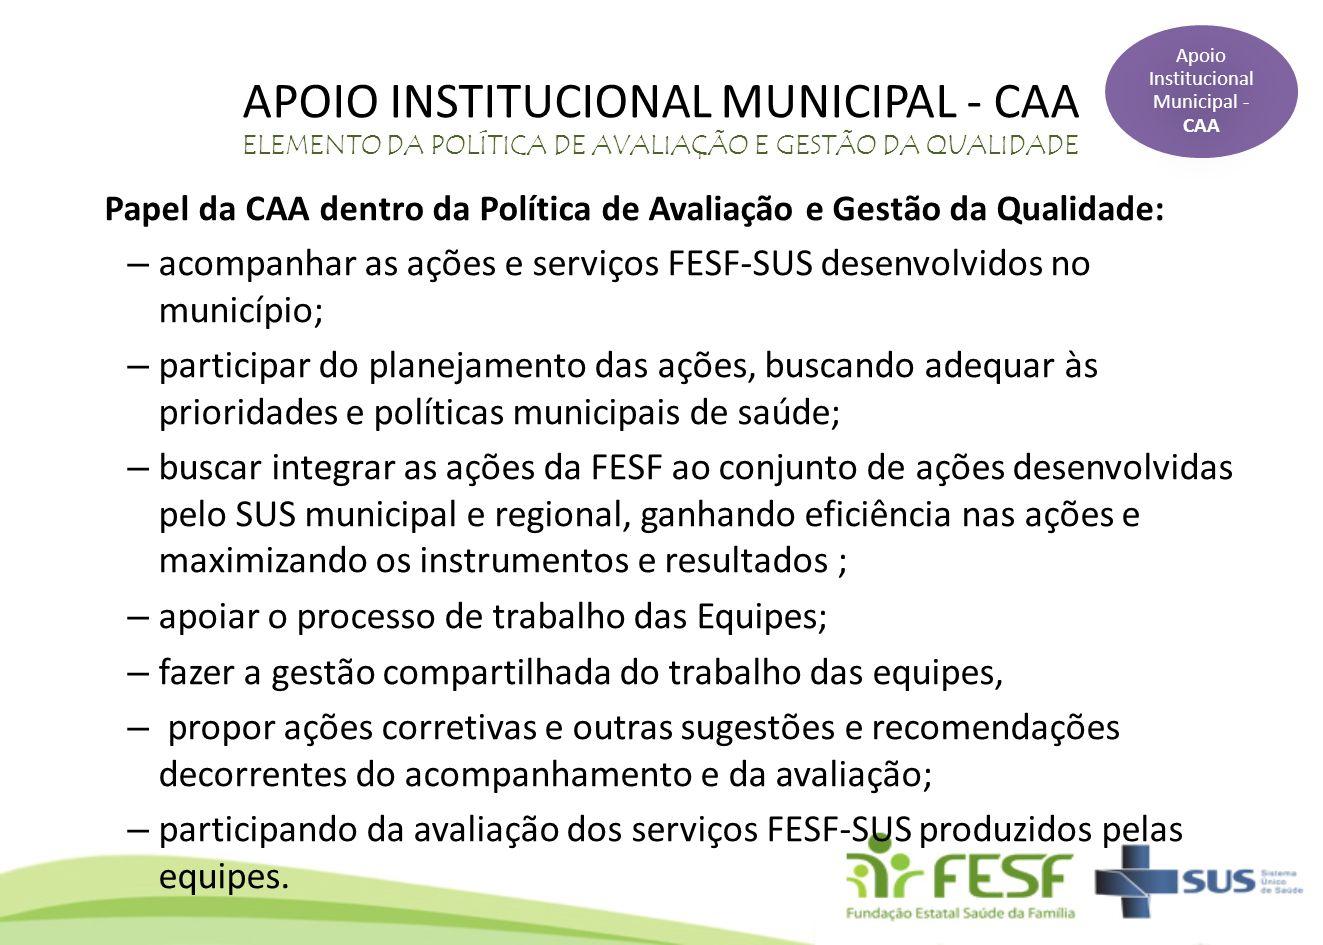 Apoio Institucional Municipal - CAA